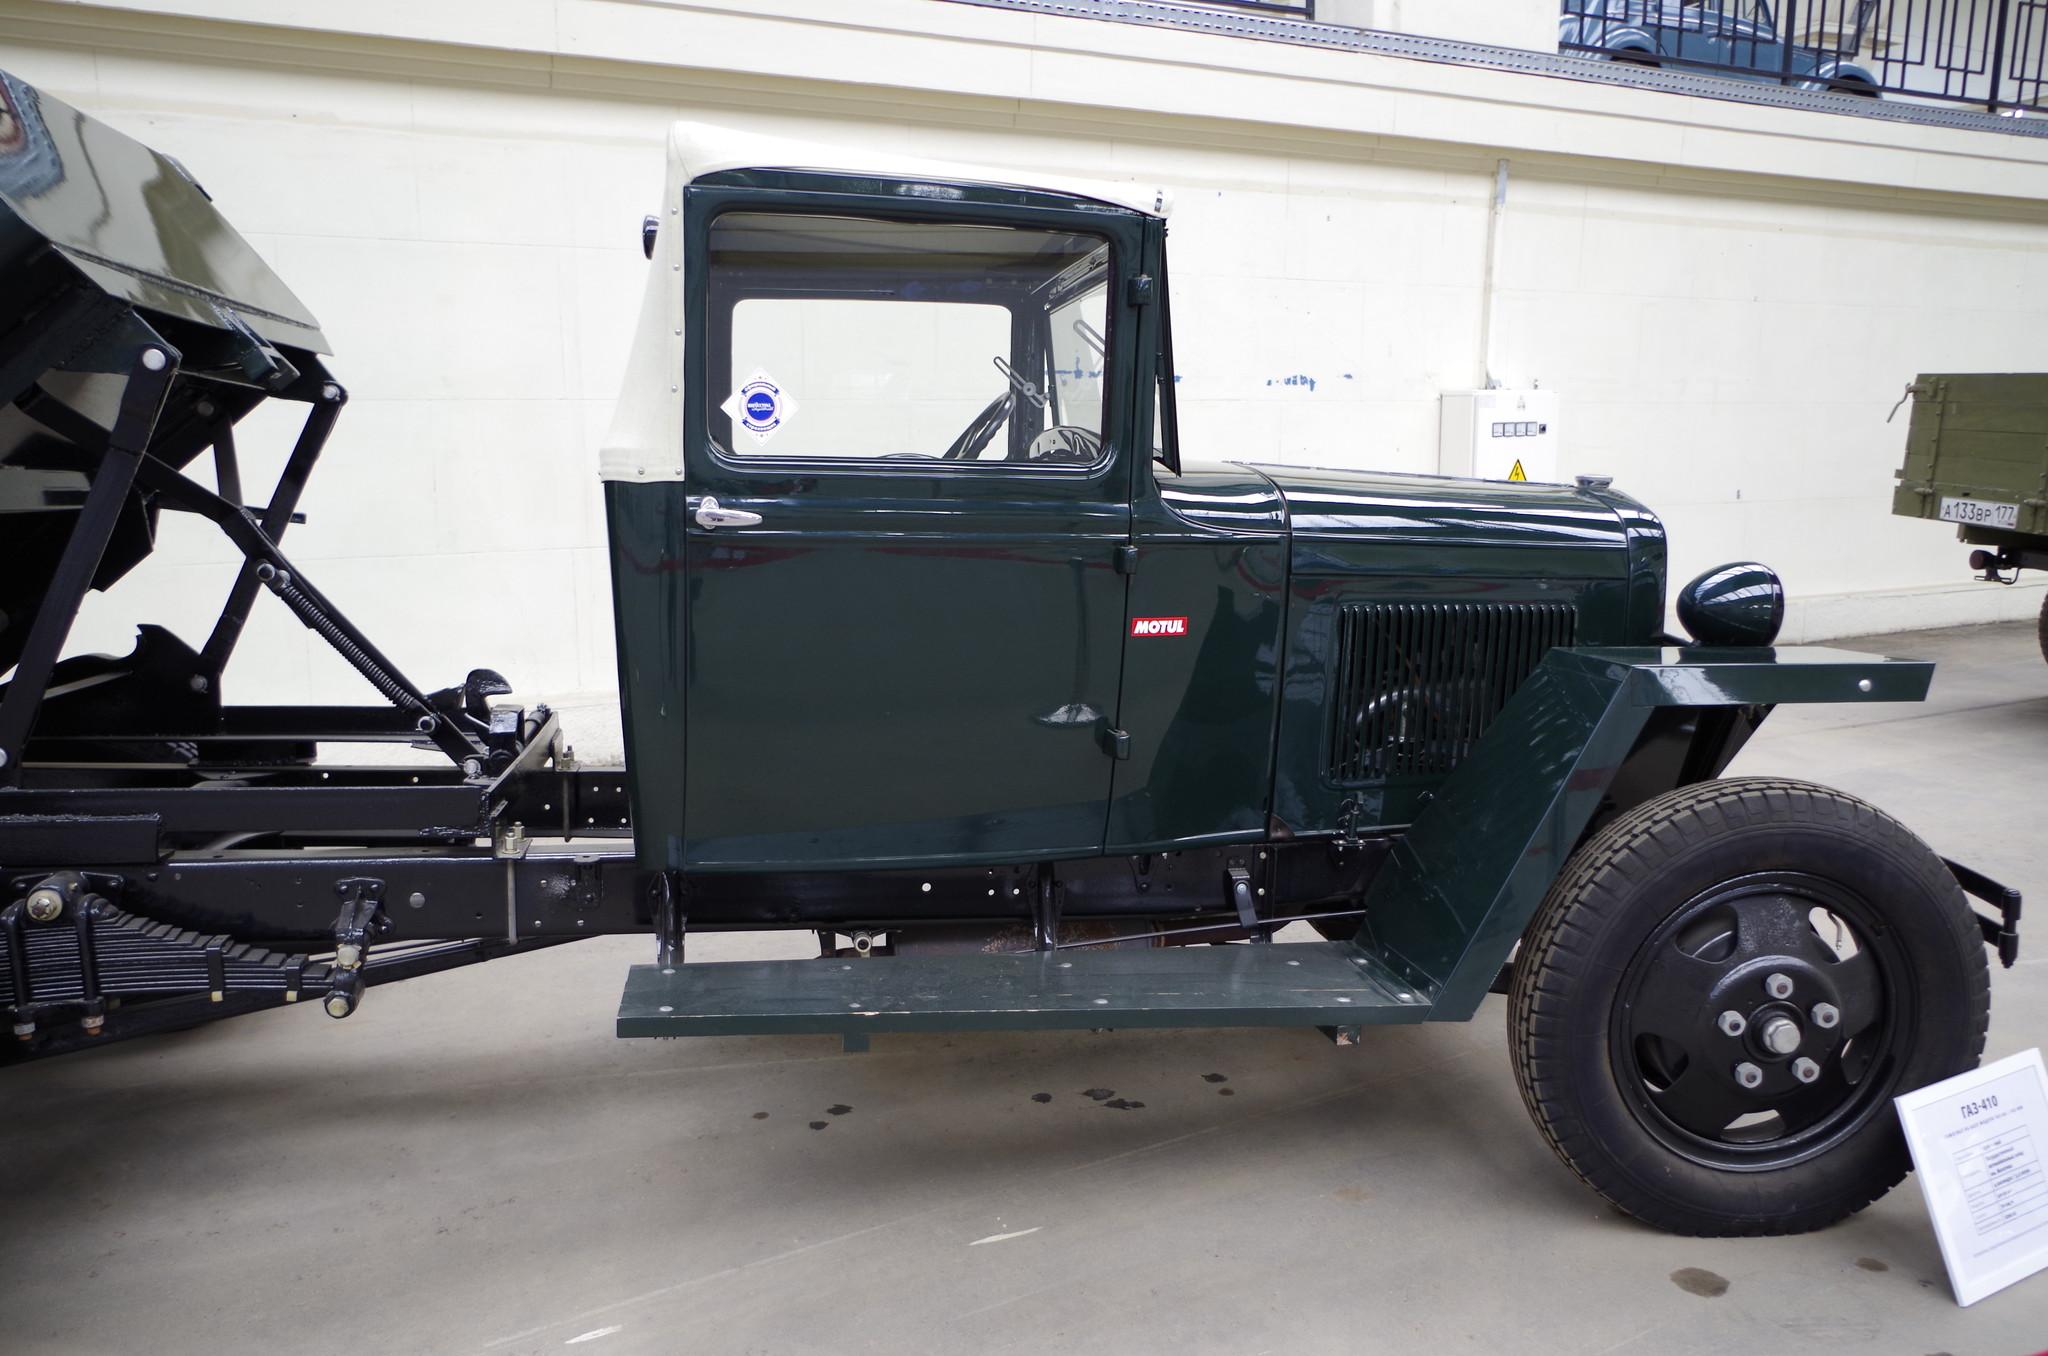 ГАЗ-410 — самосвал на базе модели ГАЗ-АА/ГАЗ-ММ